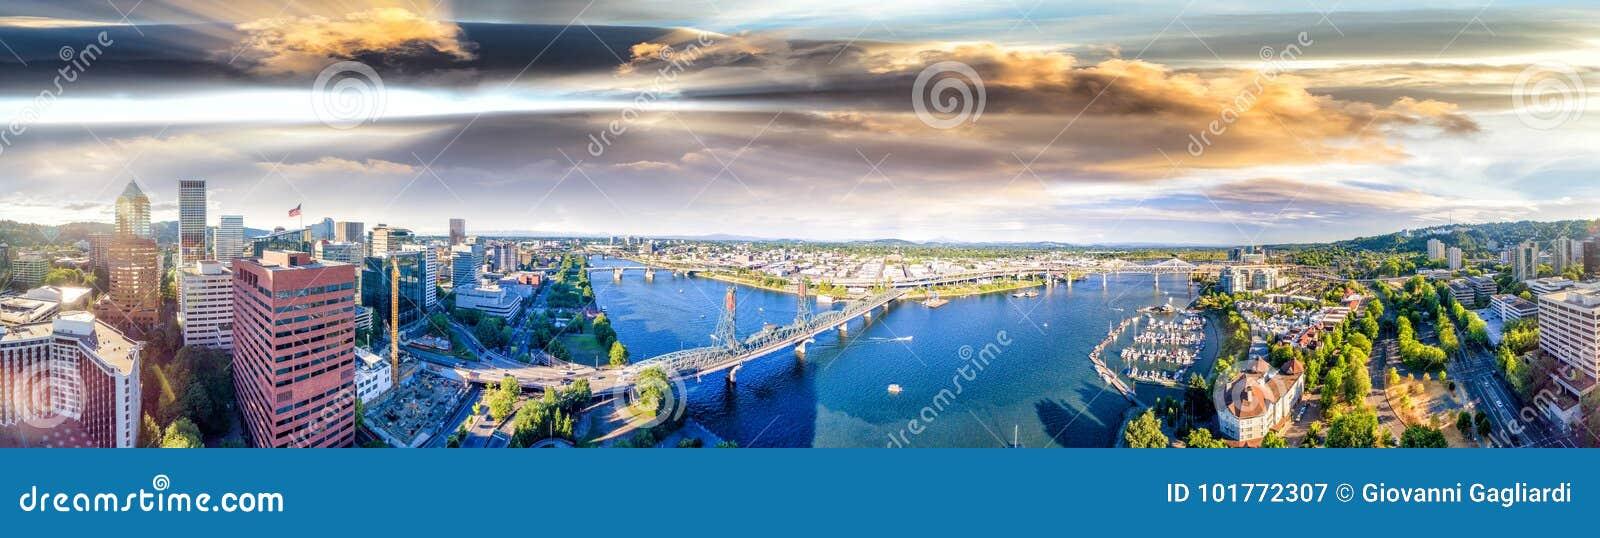 Панорамный вид с воздуха горизонта Портленда и реки Willamette